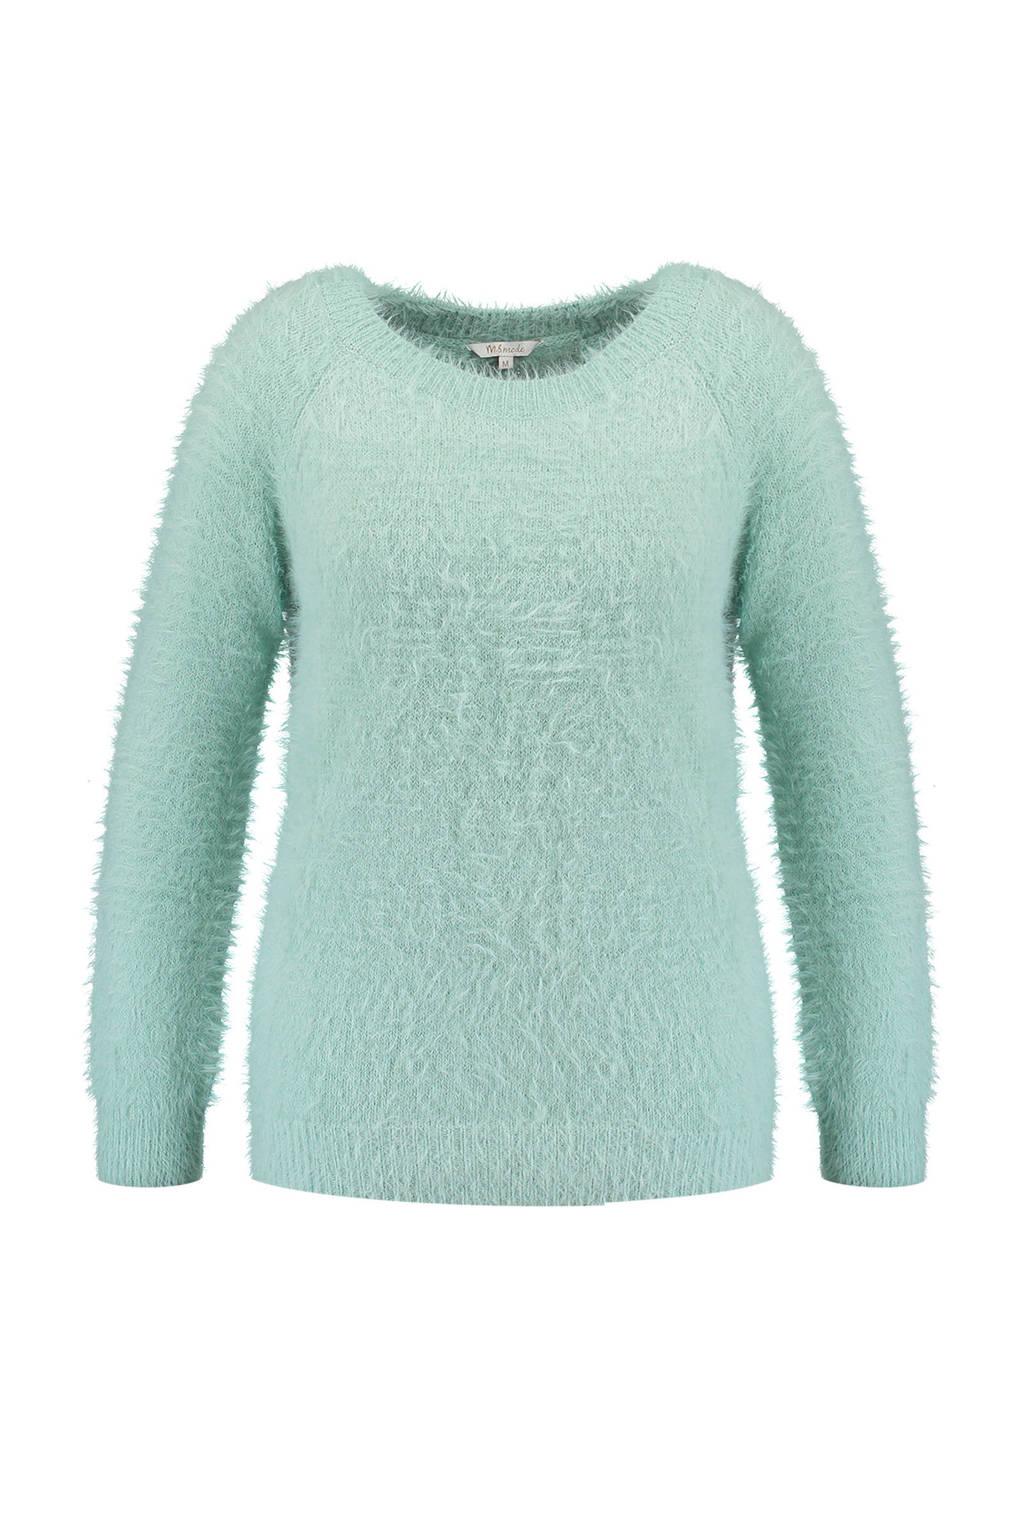 MS Mode fluffy trui, licht blauw